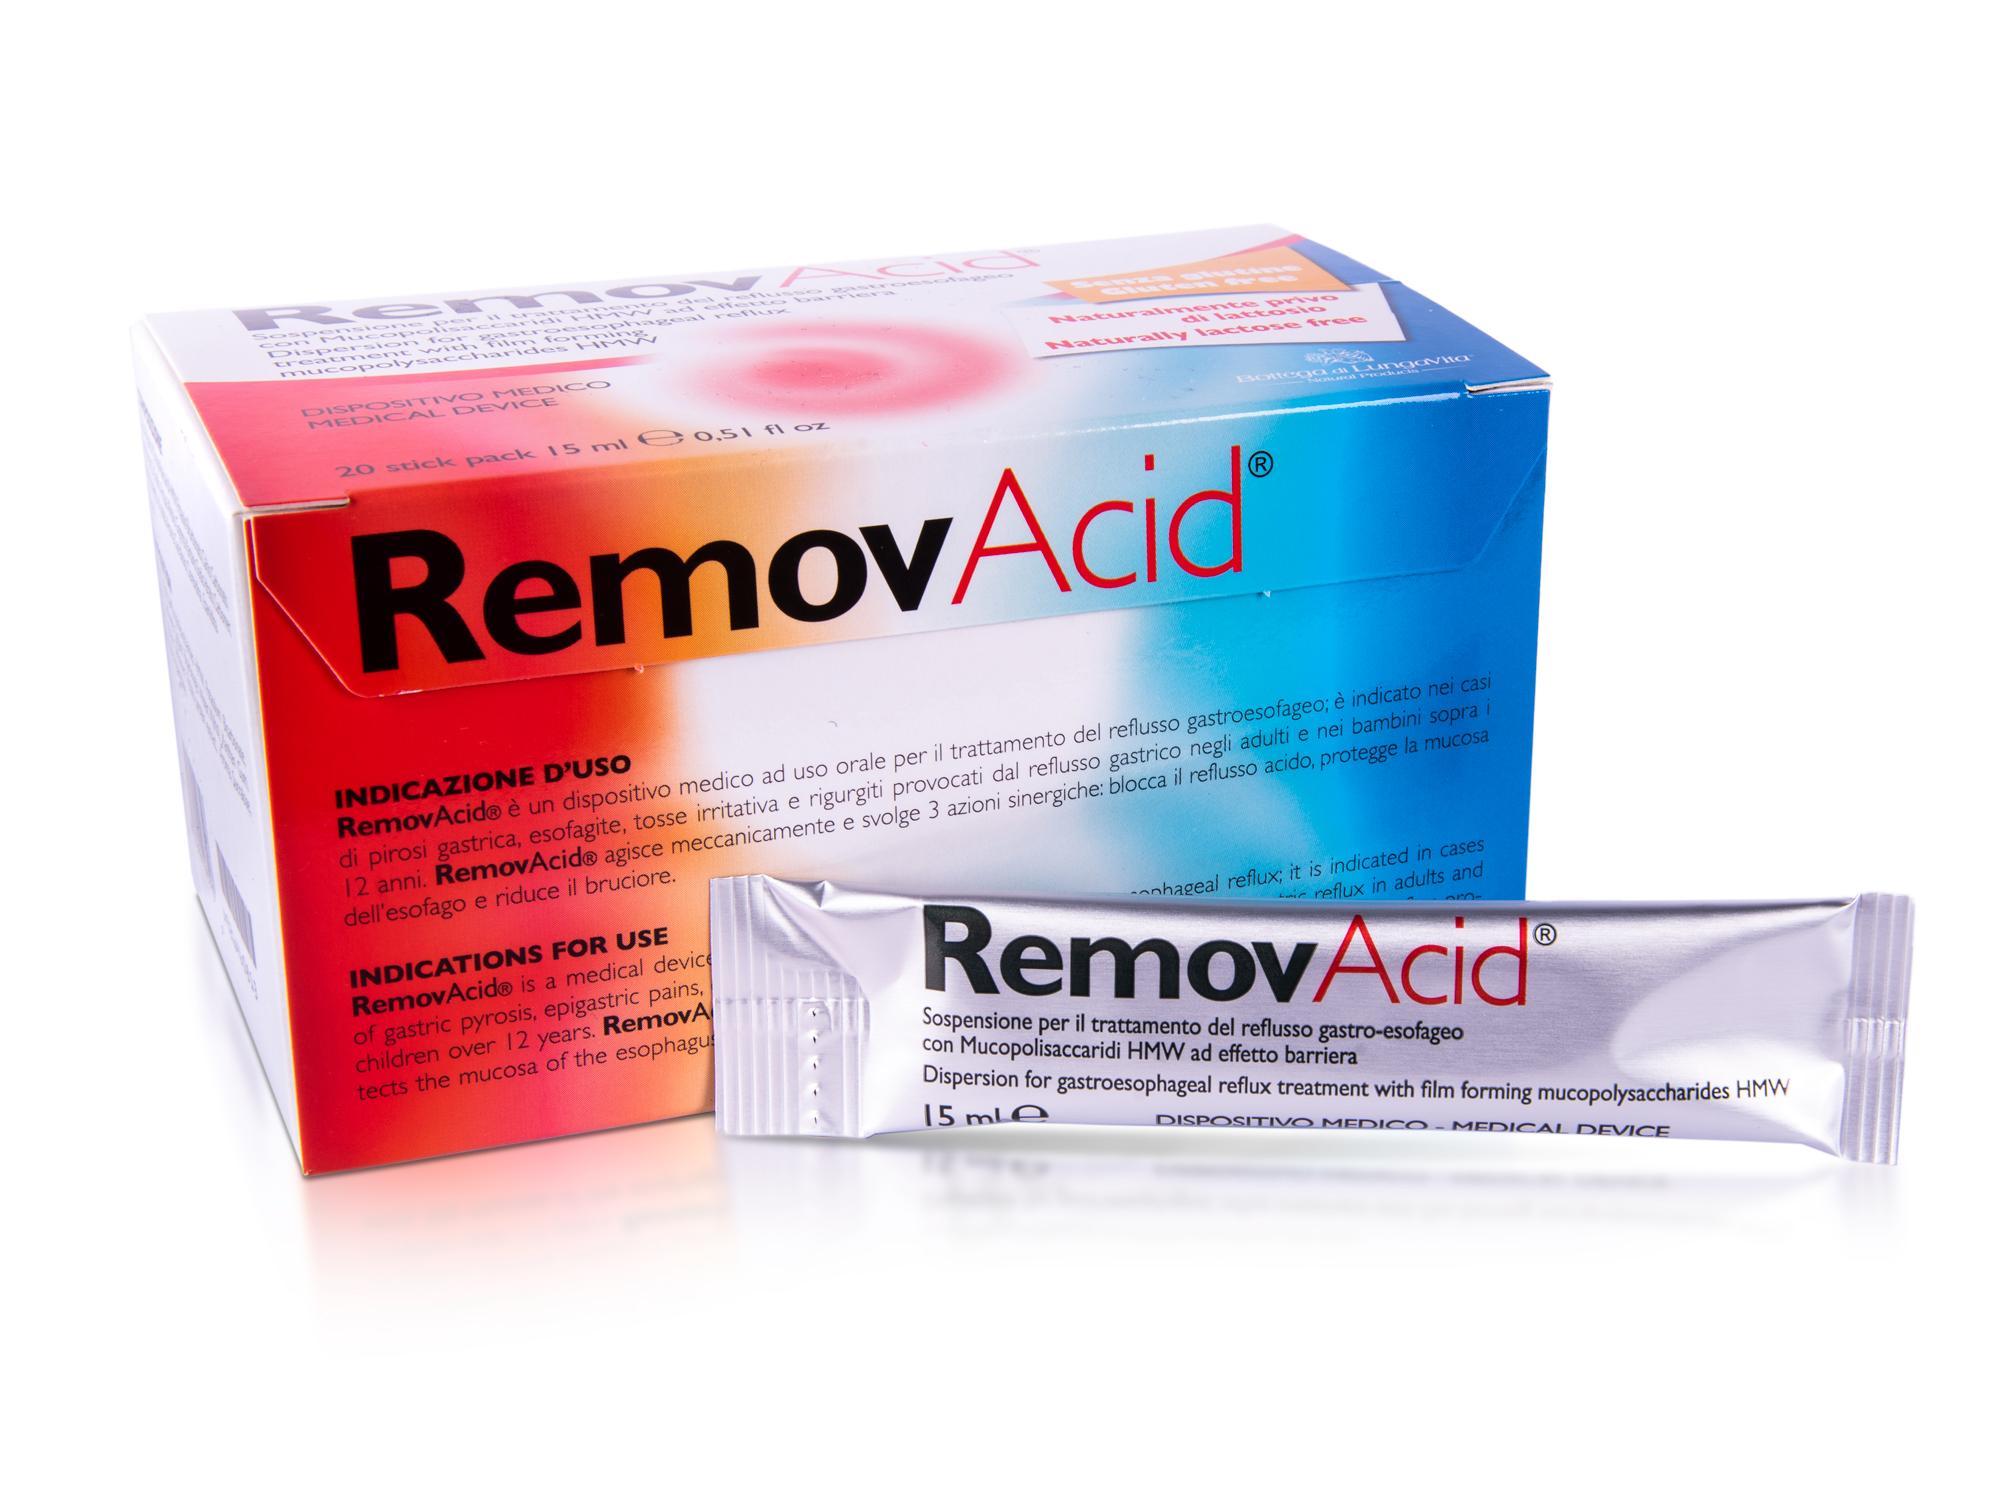 REMOV ACID - MEDICAL DEVICE FOR GASTRIC REFLUX